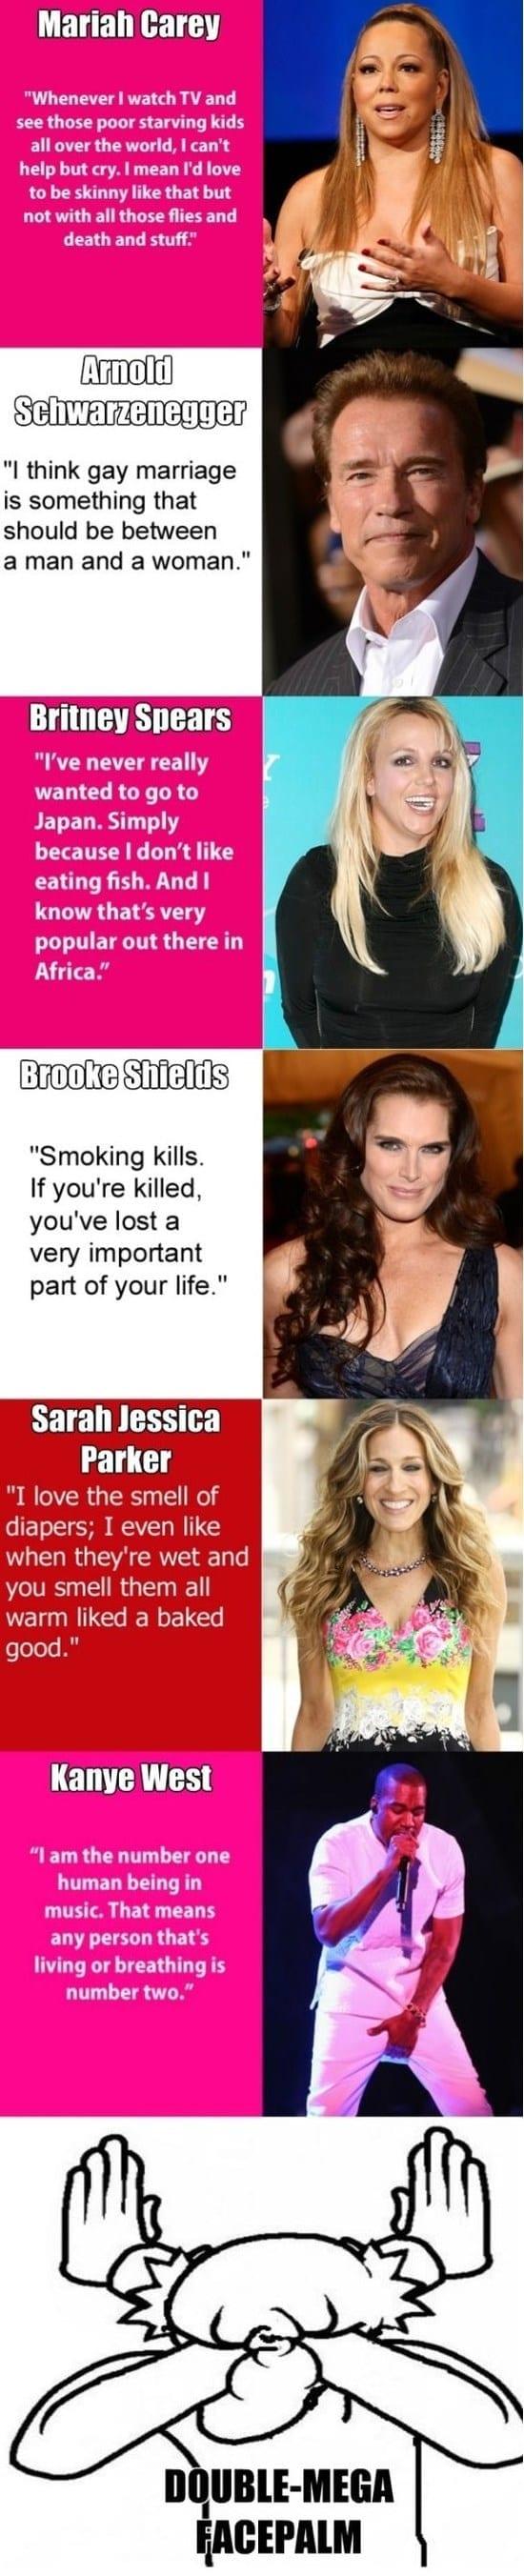 dumb-celebrity-quotes